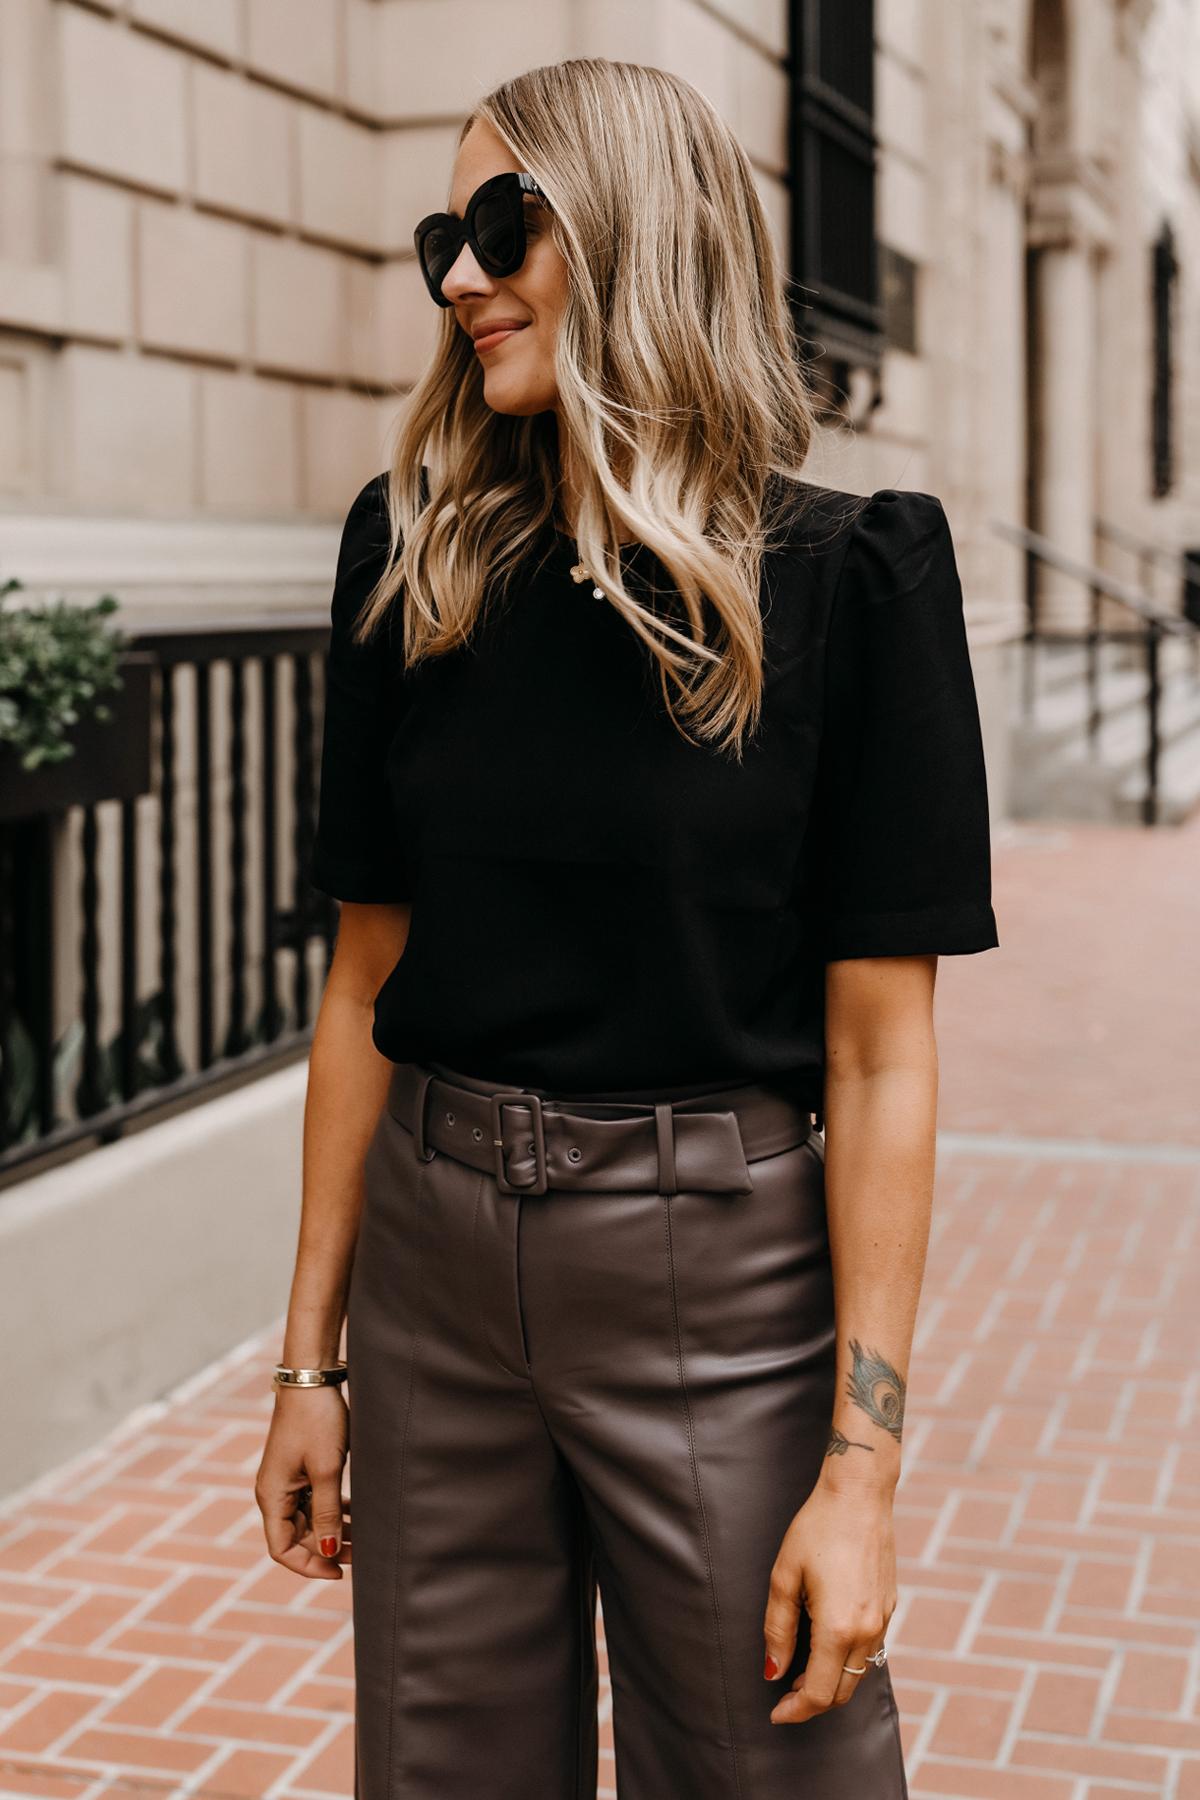 Fashion Jackson Wearing Ann Taylor Black Puff Sleeve Top Workwear Attire